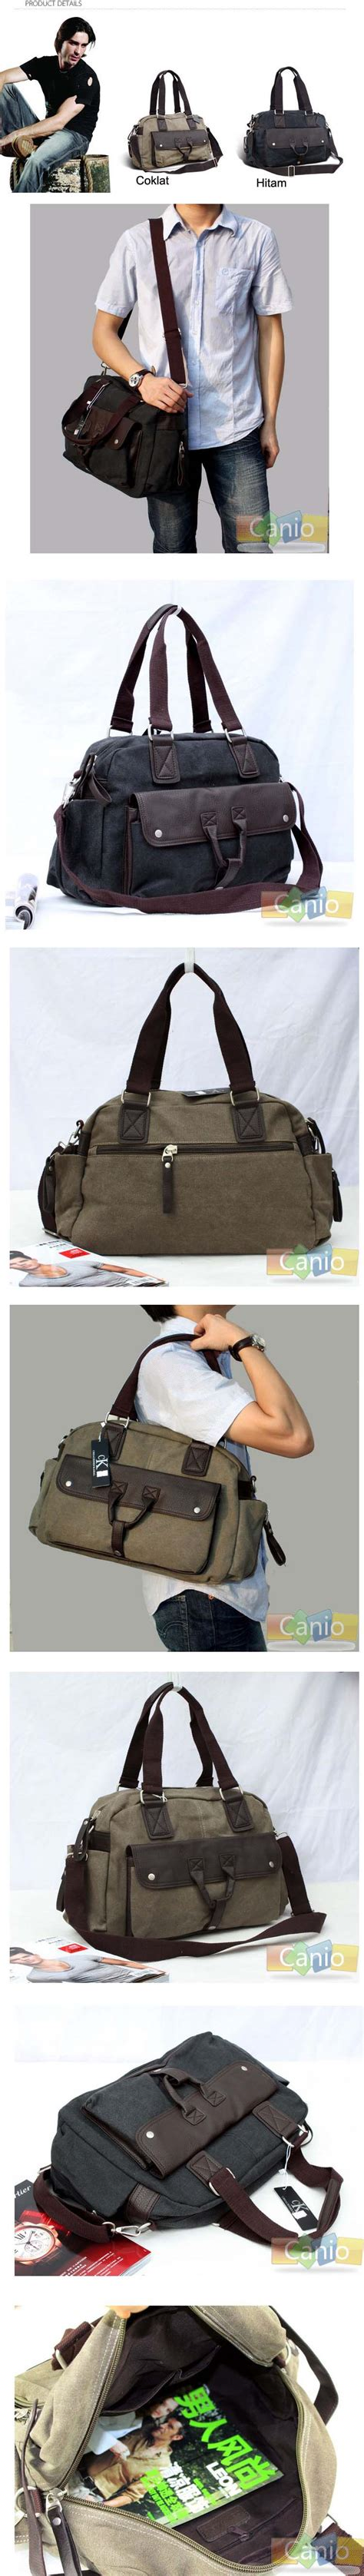 Travel Bag Kanvastas Tenteng Baju jual tas selempang dan tas tenteng